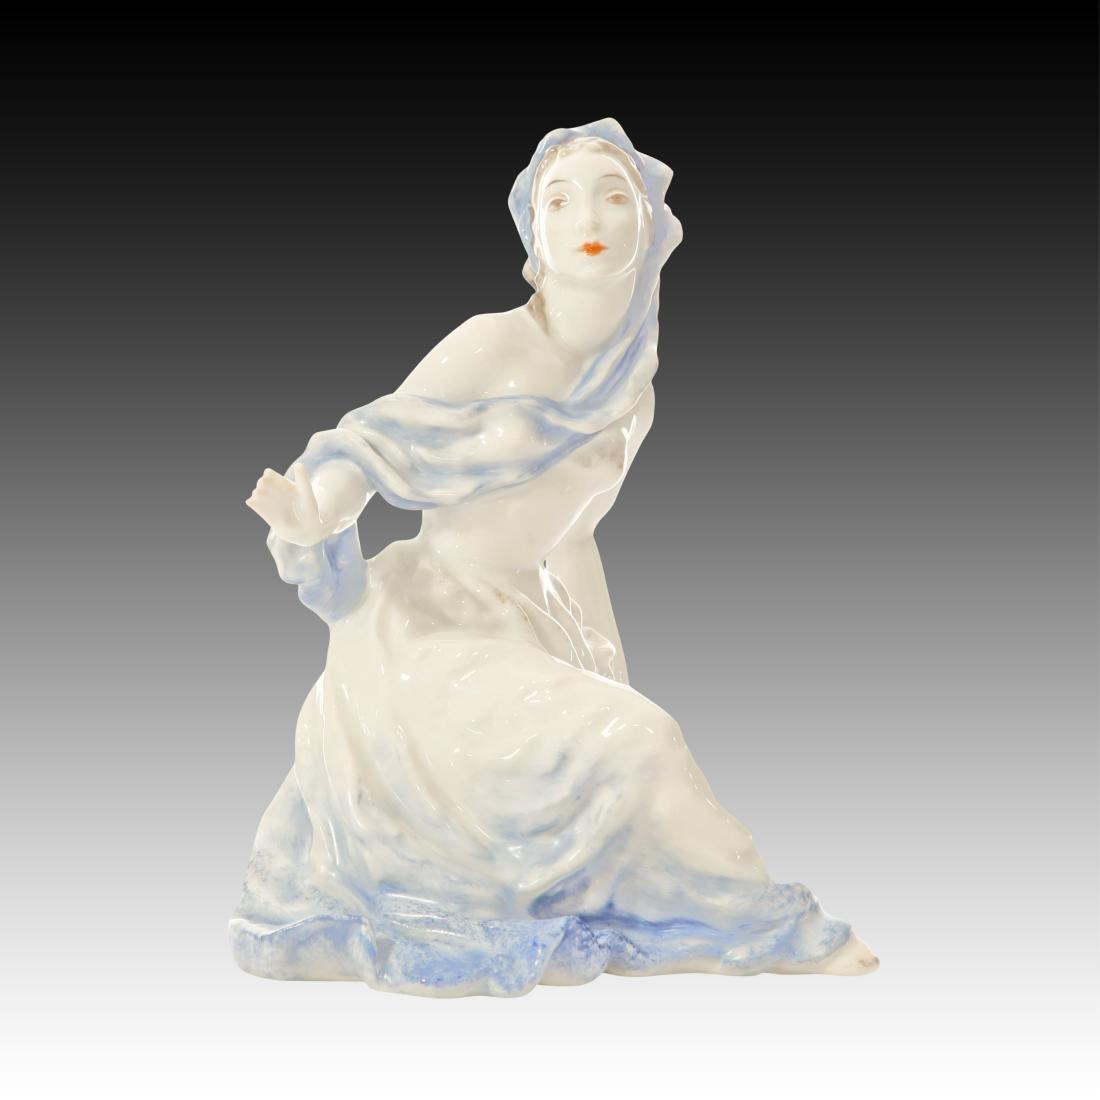 Rosenthal Ballet Dancer Figurine